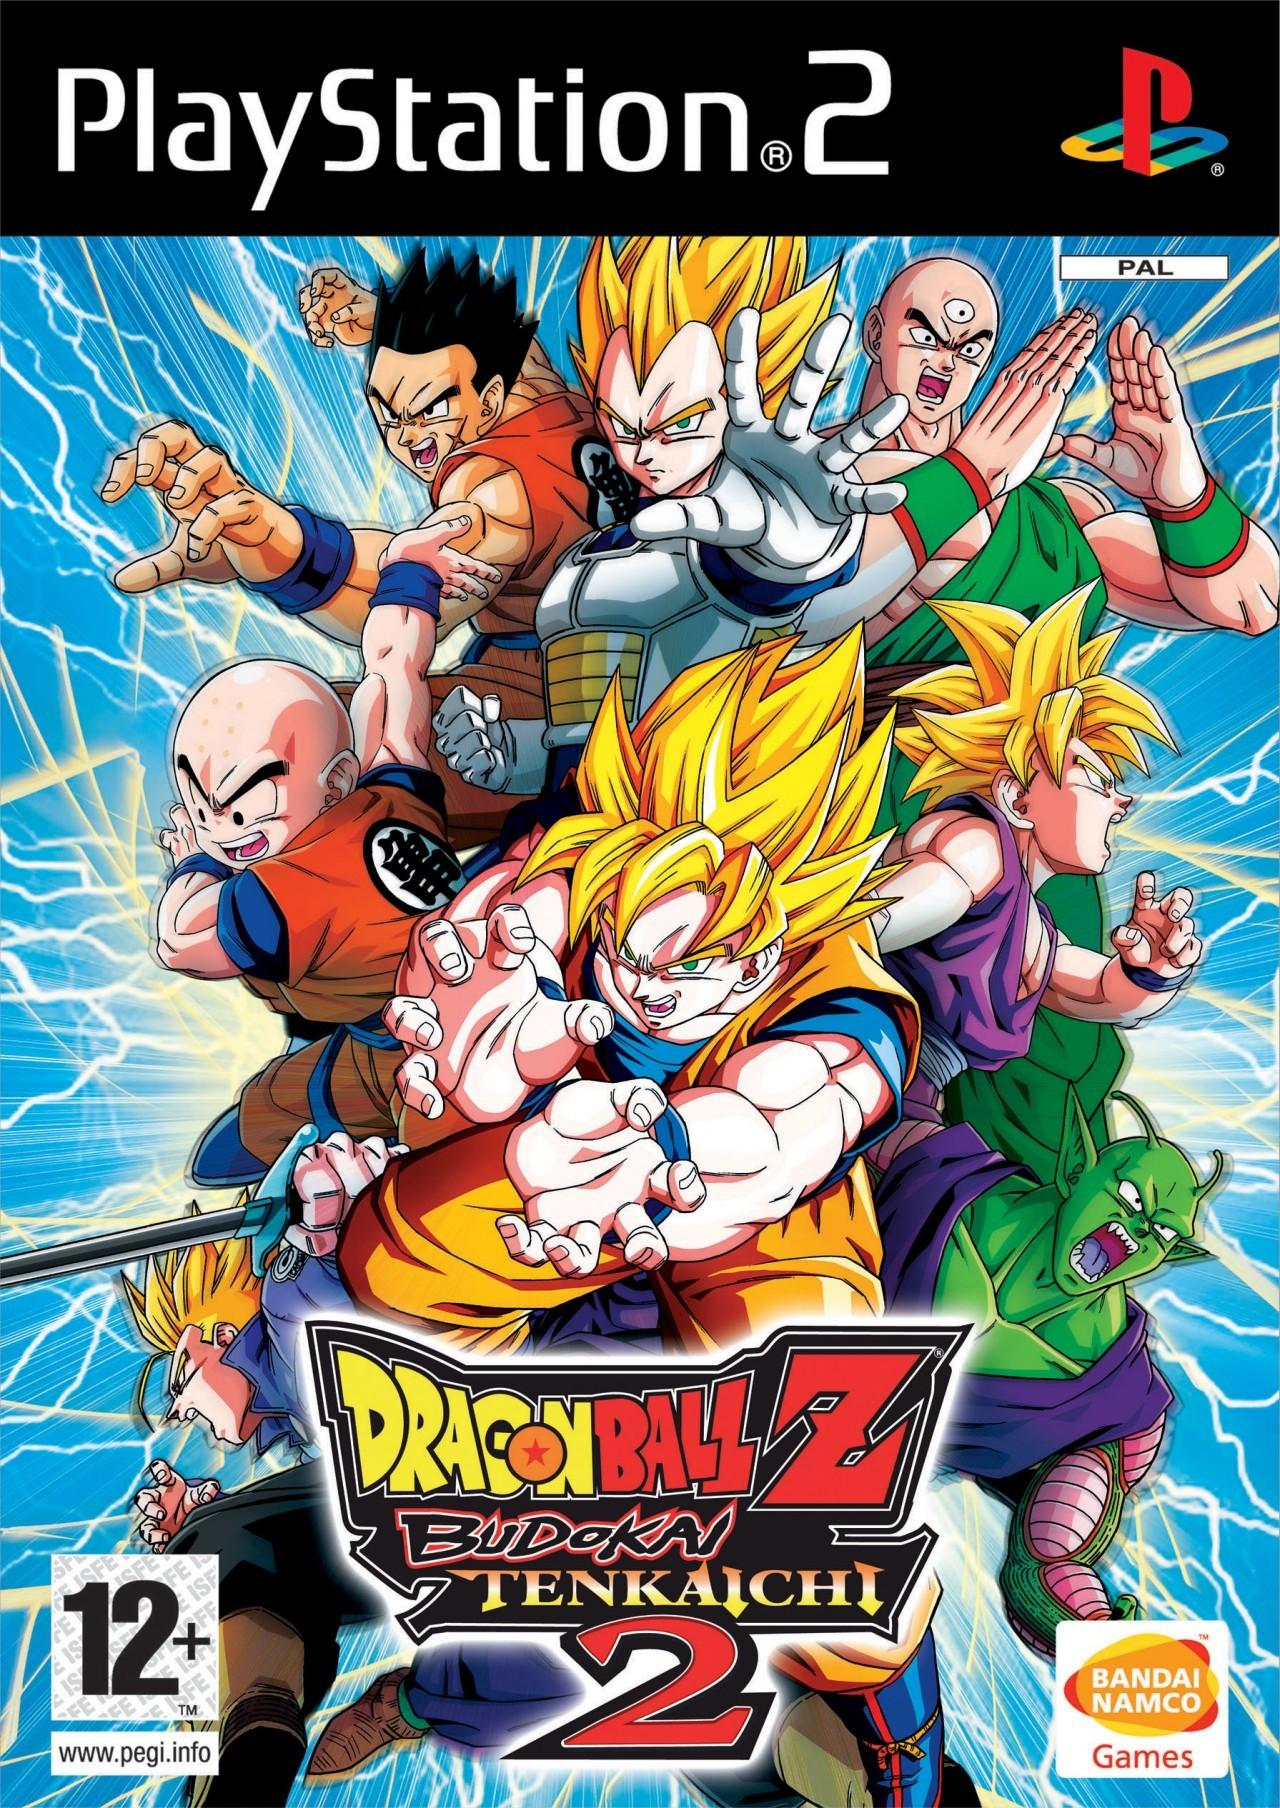 Dragon Ball Z: Budokai Tenkaichi 2 | Dragon Ball Wiki ...